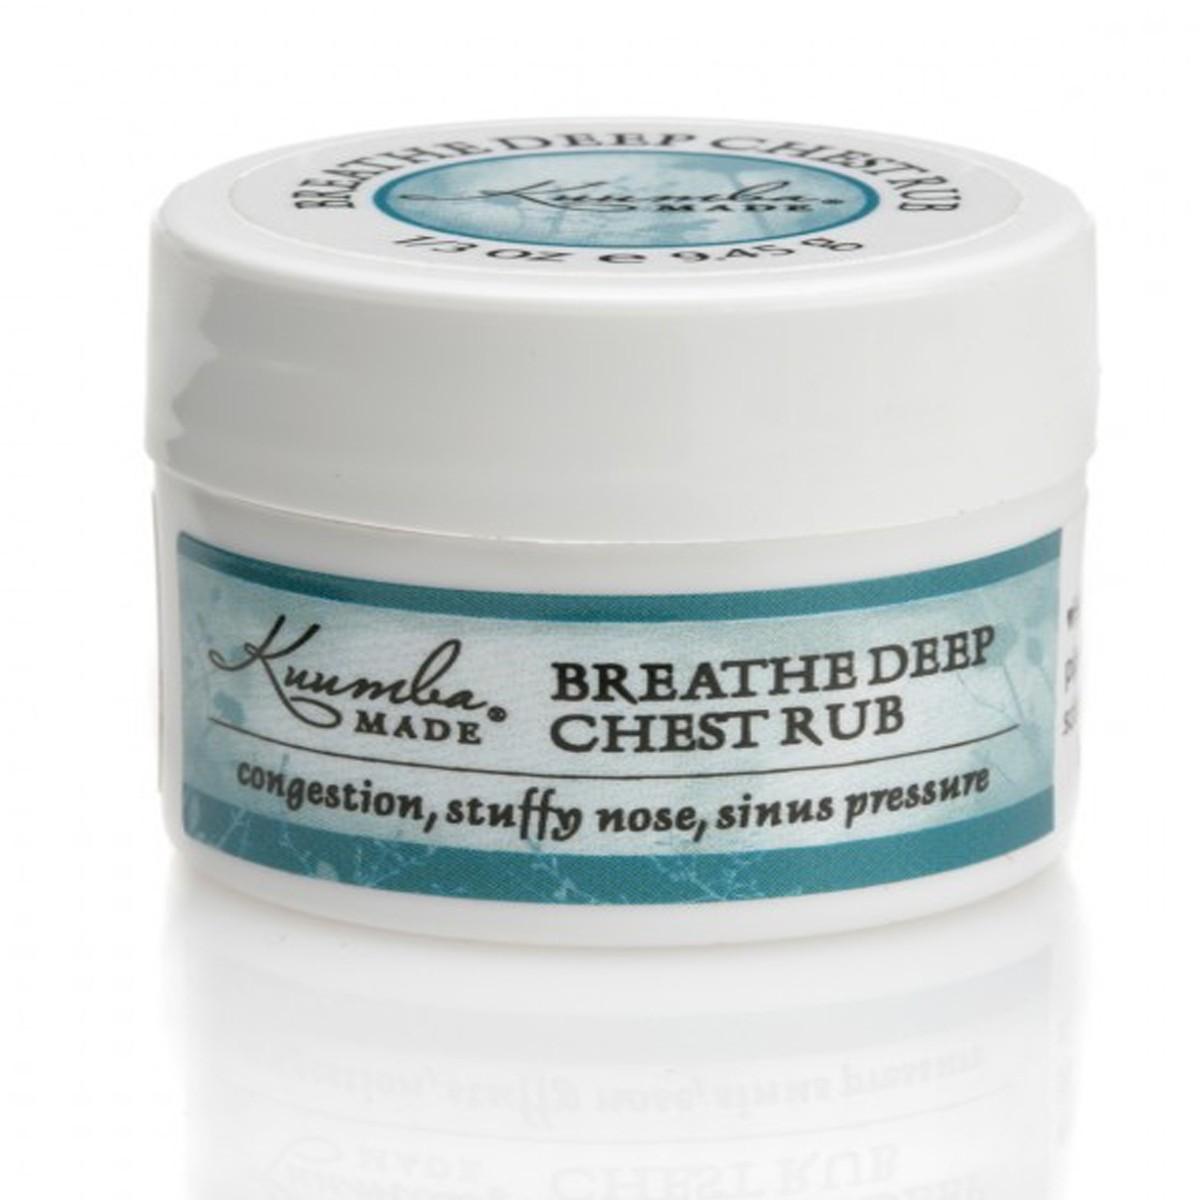 Kuumba Made Breathe Deep Chest Rub